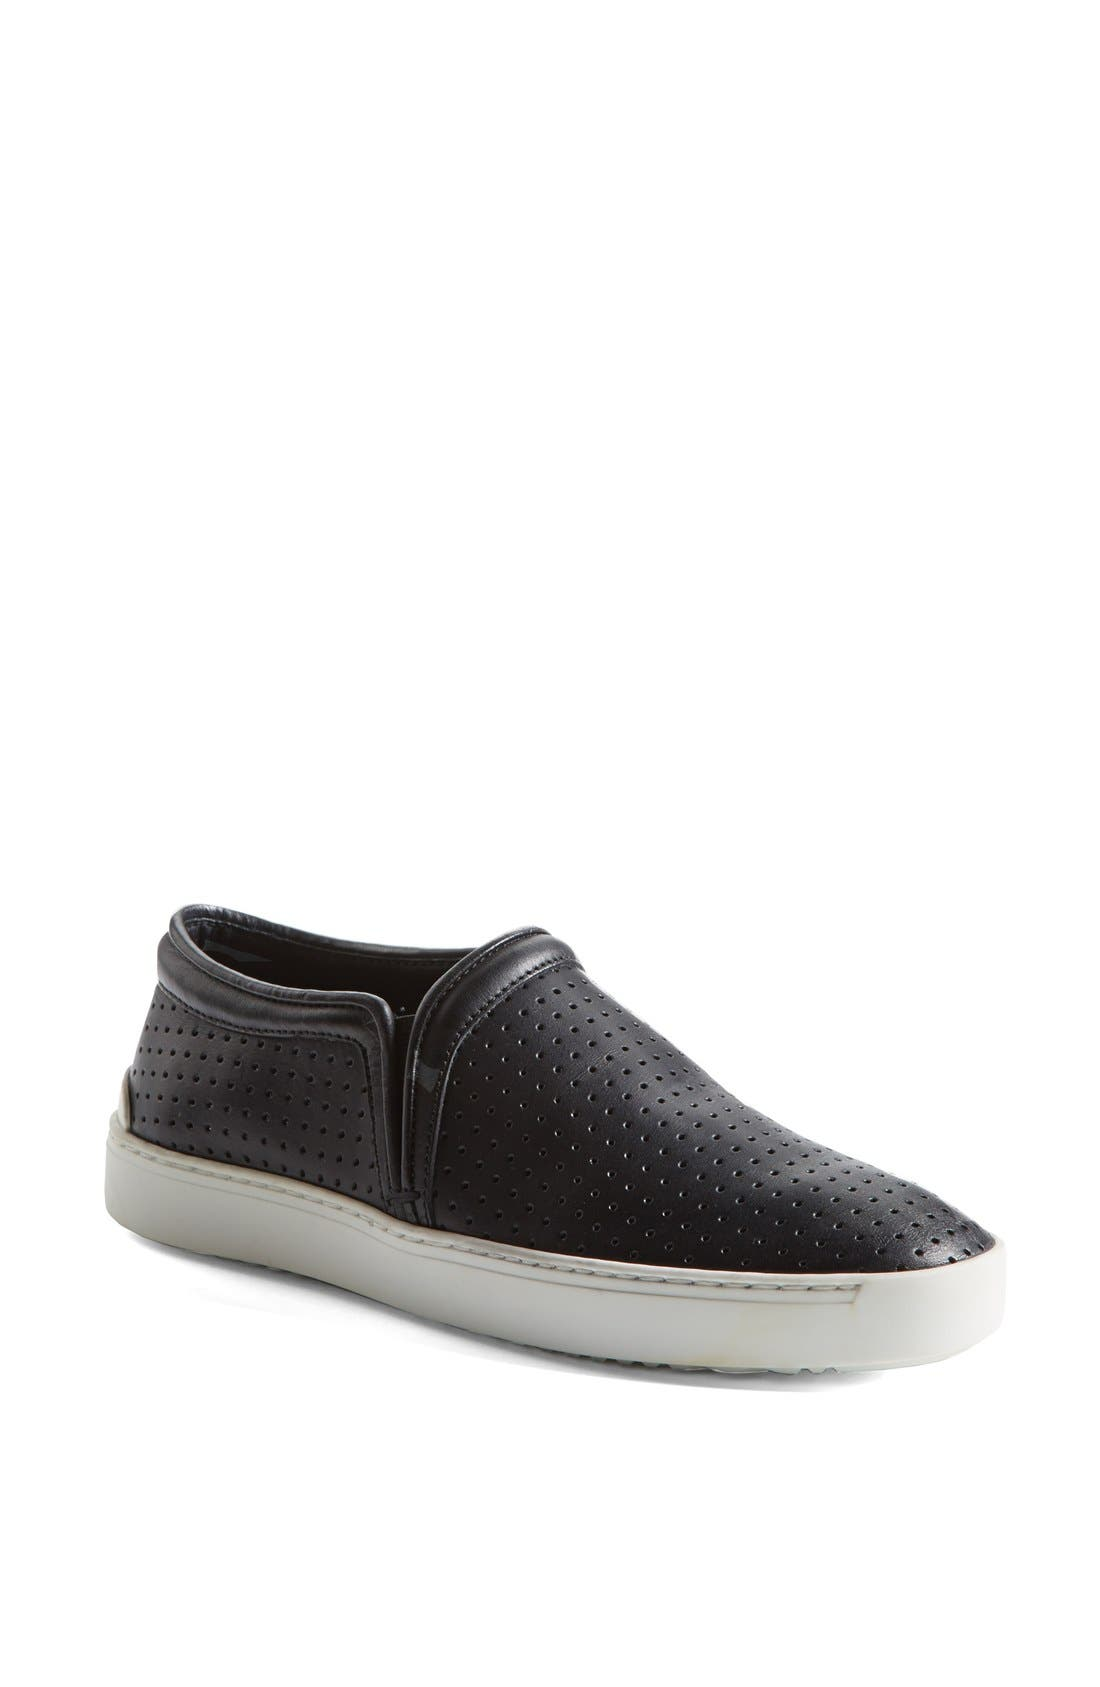 Alternate Image 1 Selected - rag & bone 'Kent' Perforated Leather Slip-On